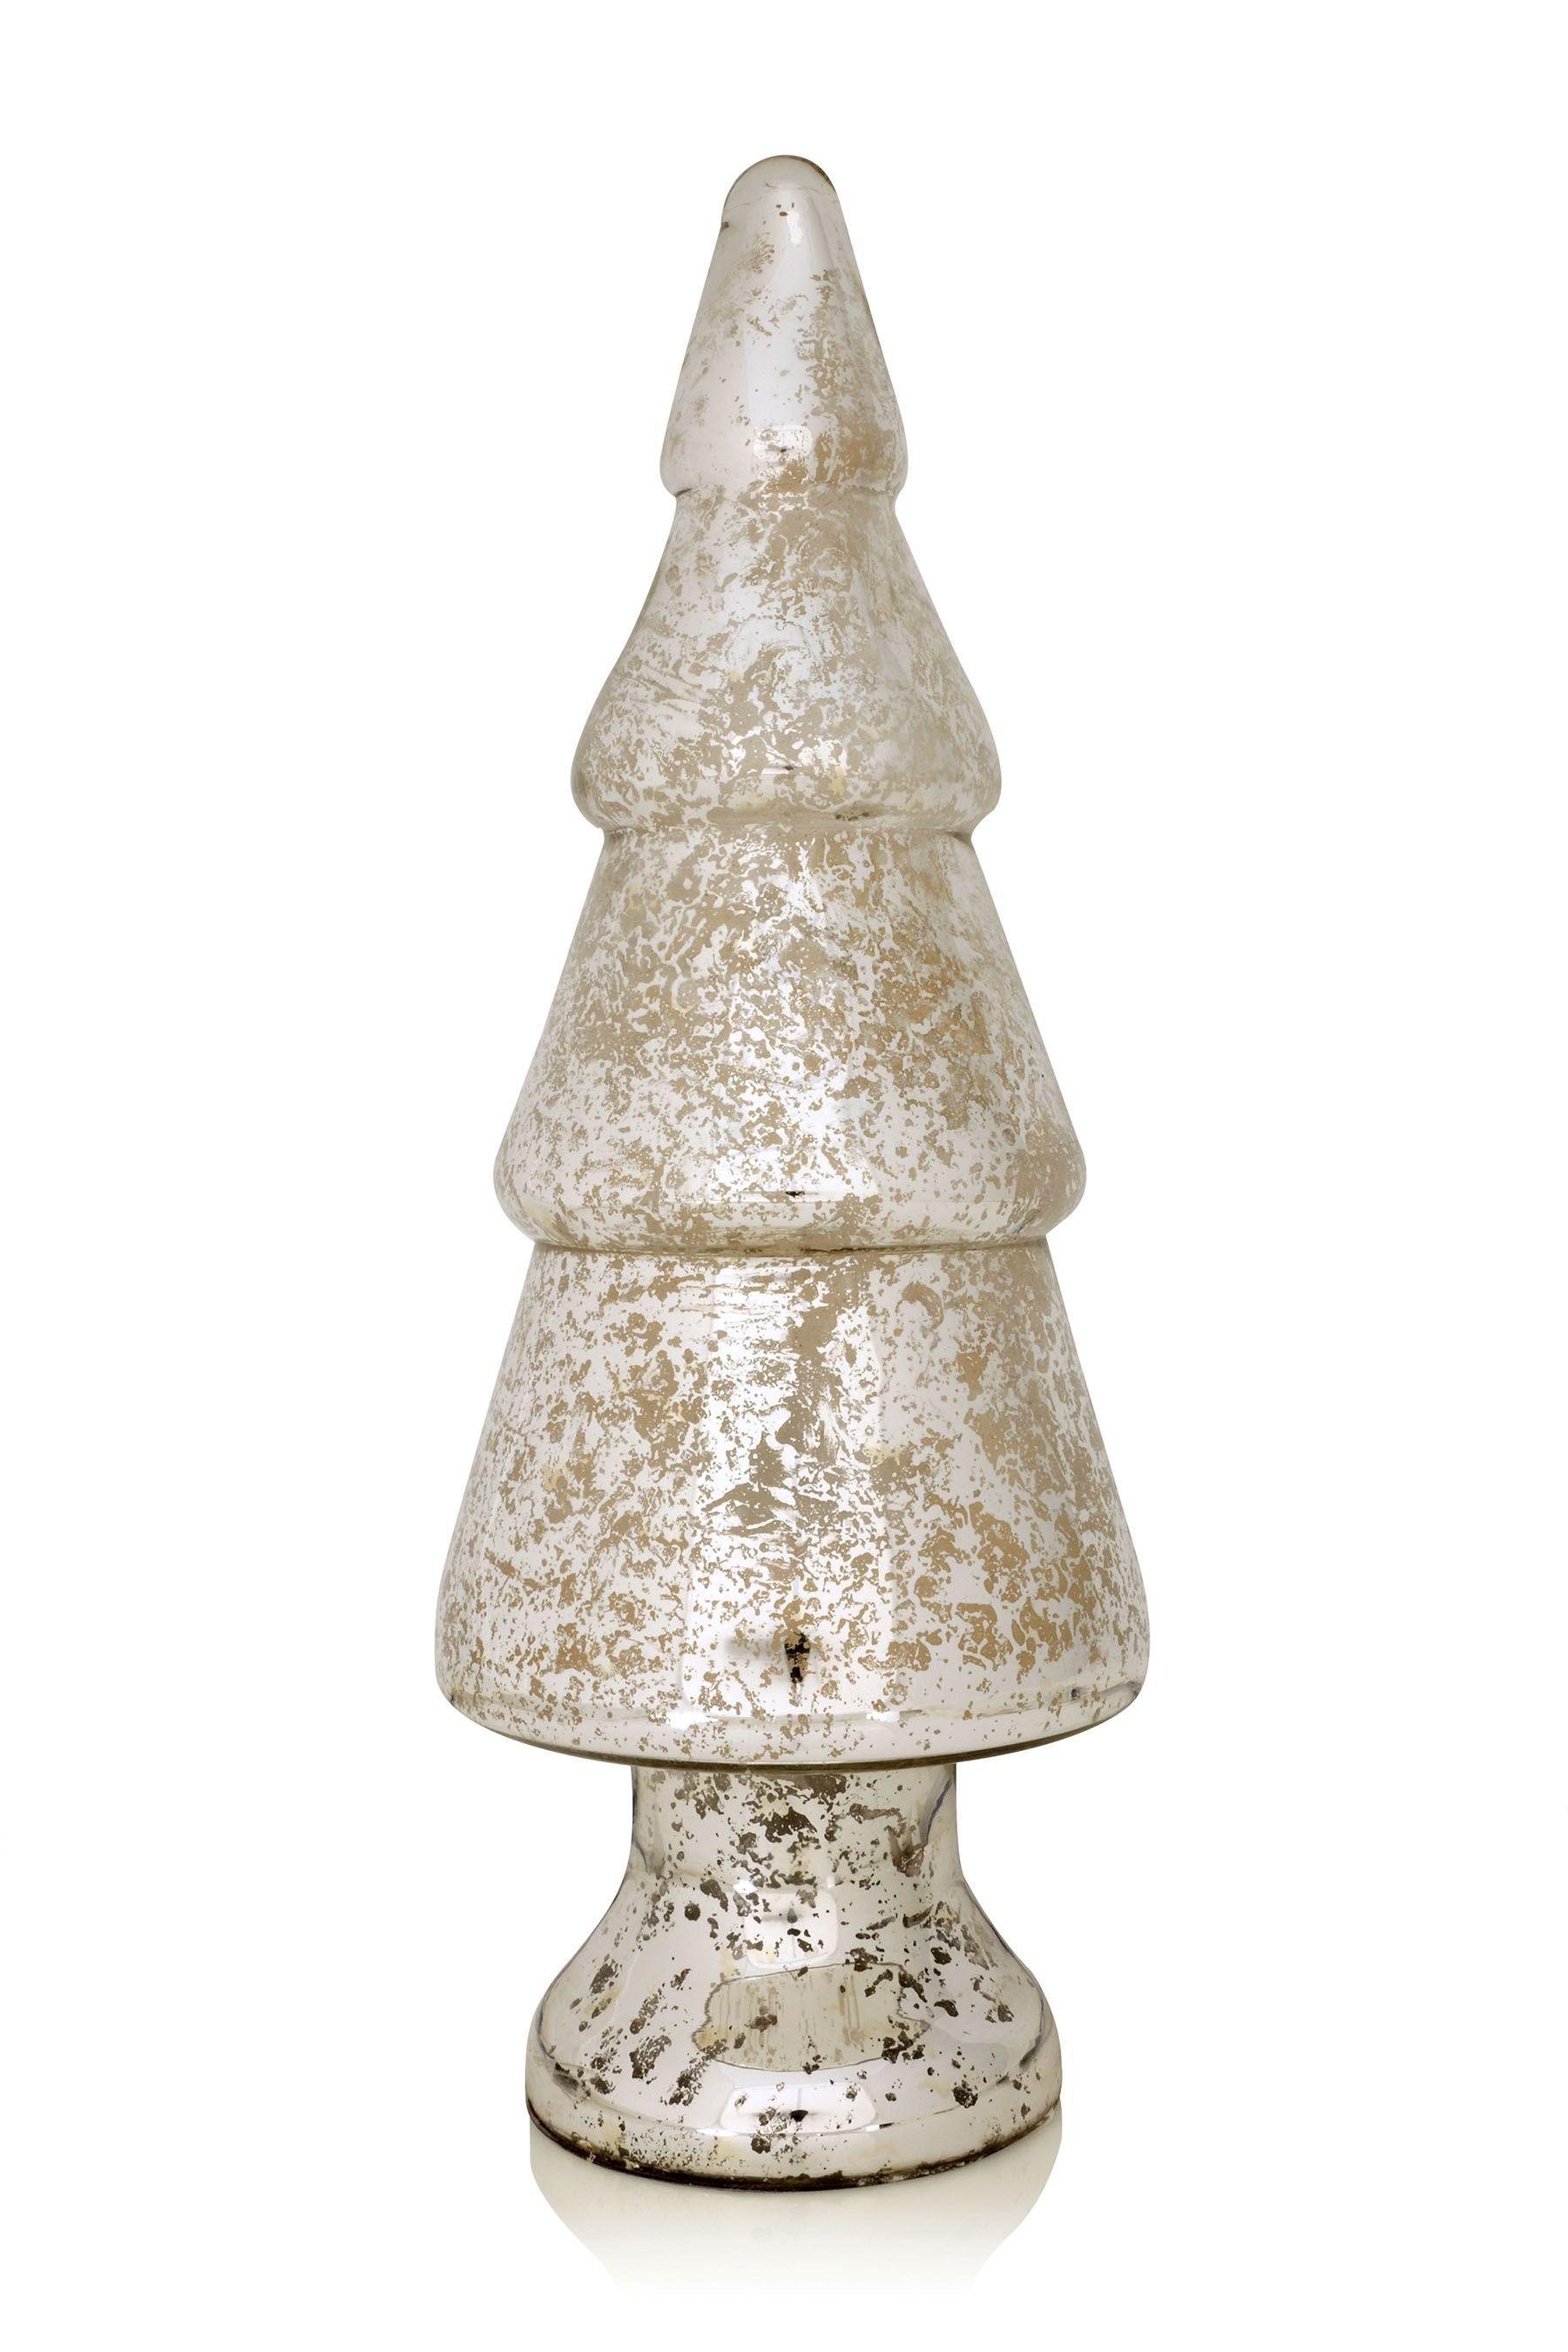 mercury effect glass tree from next uk online shop